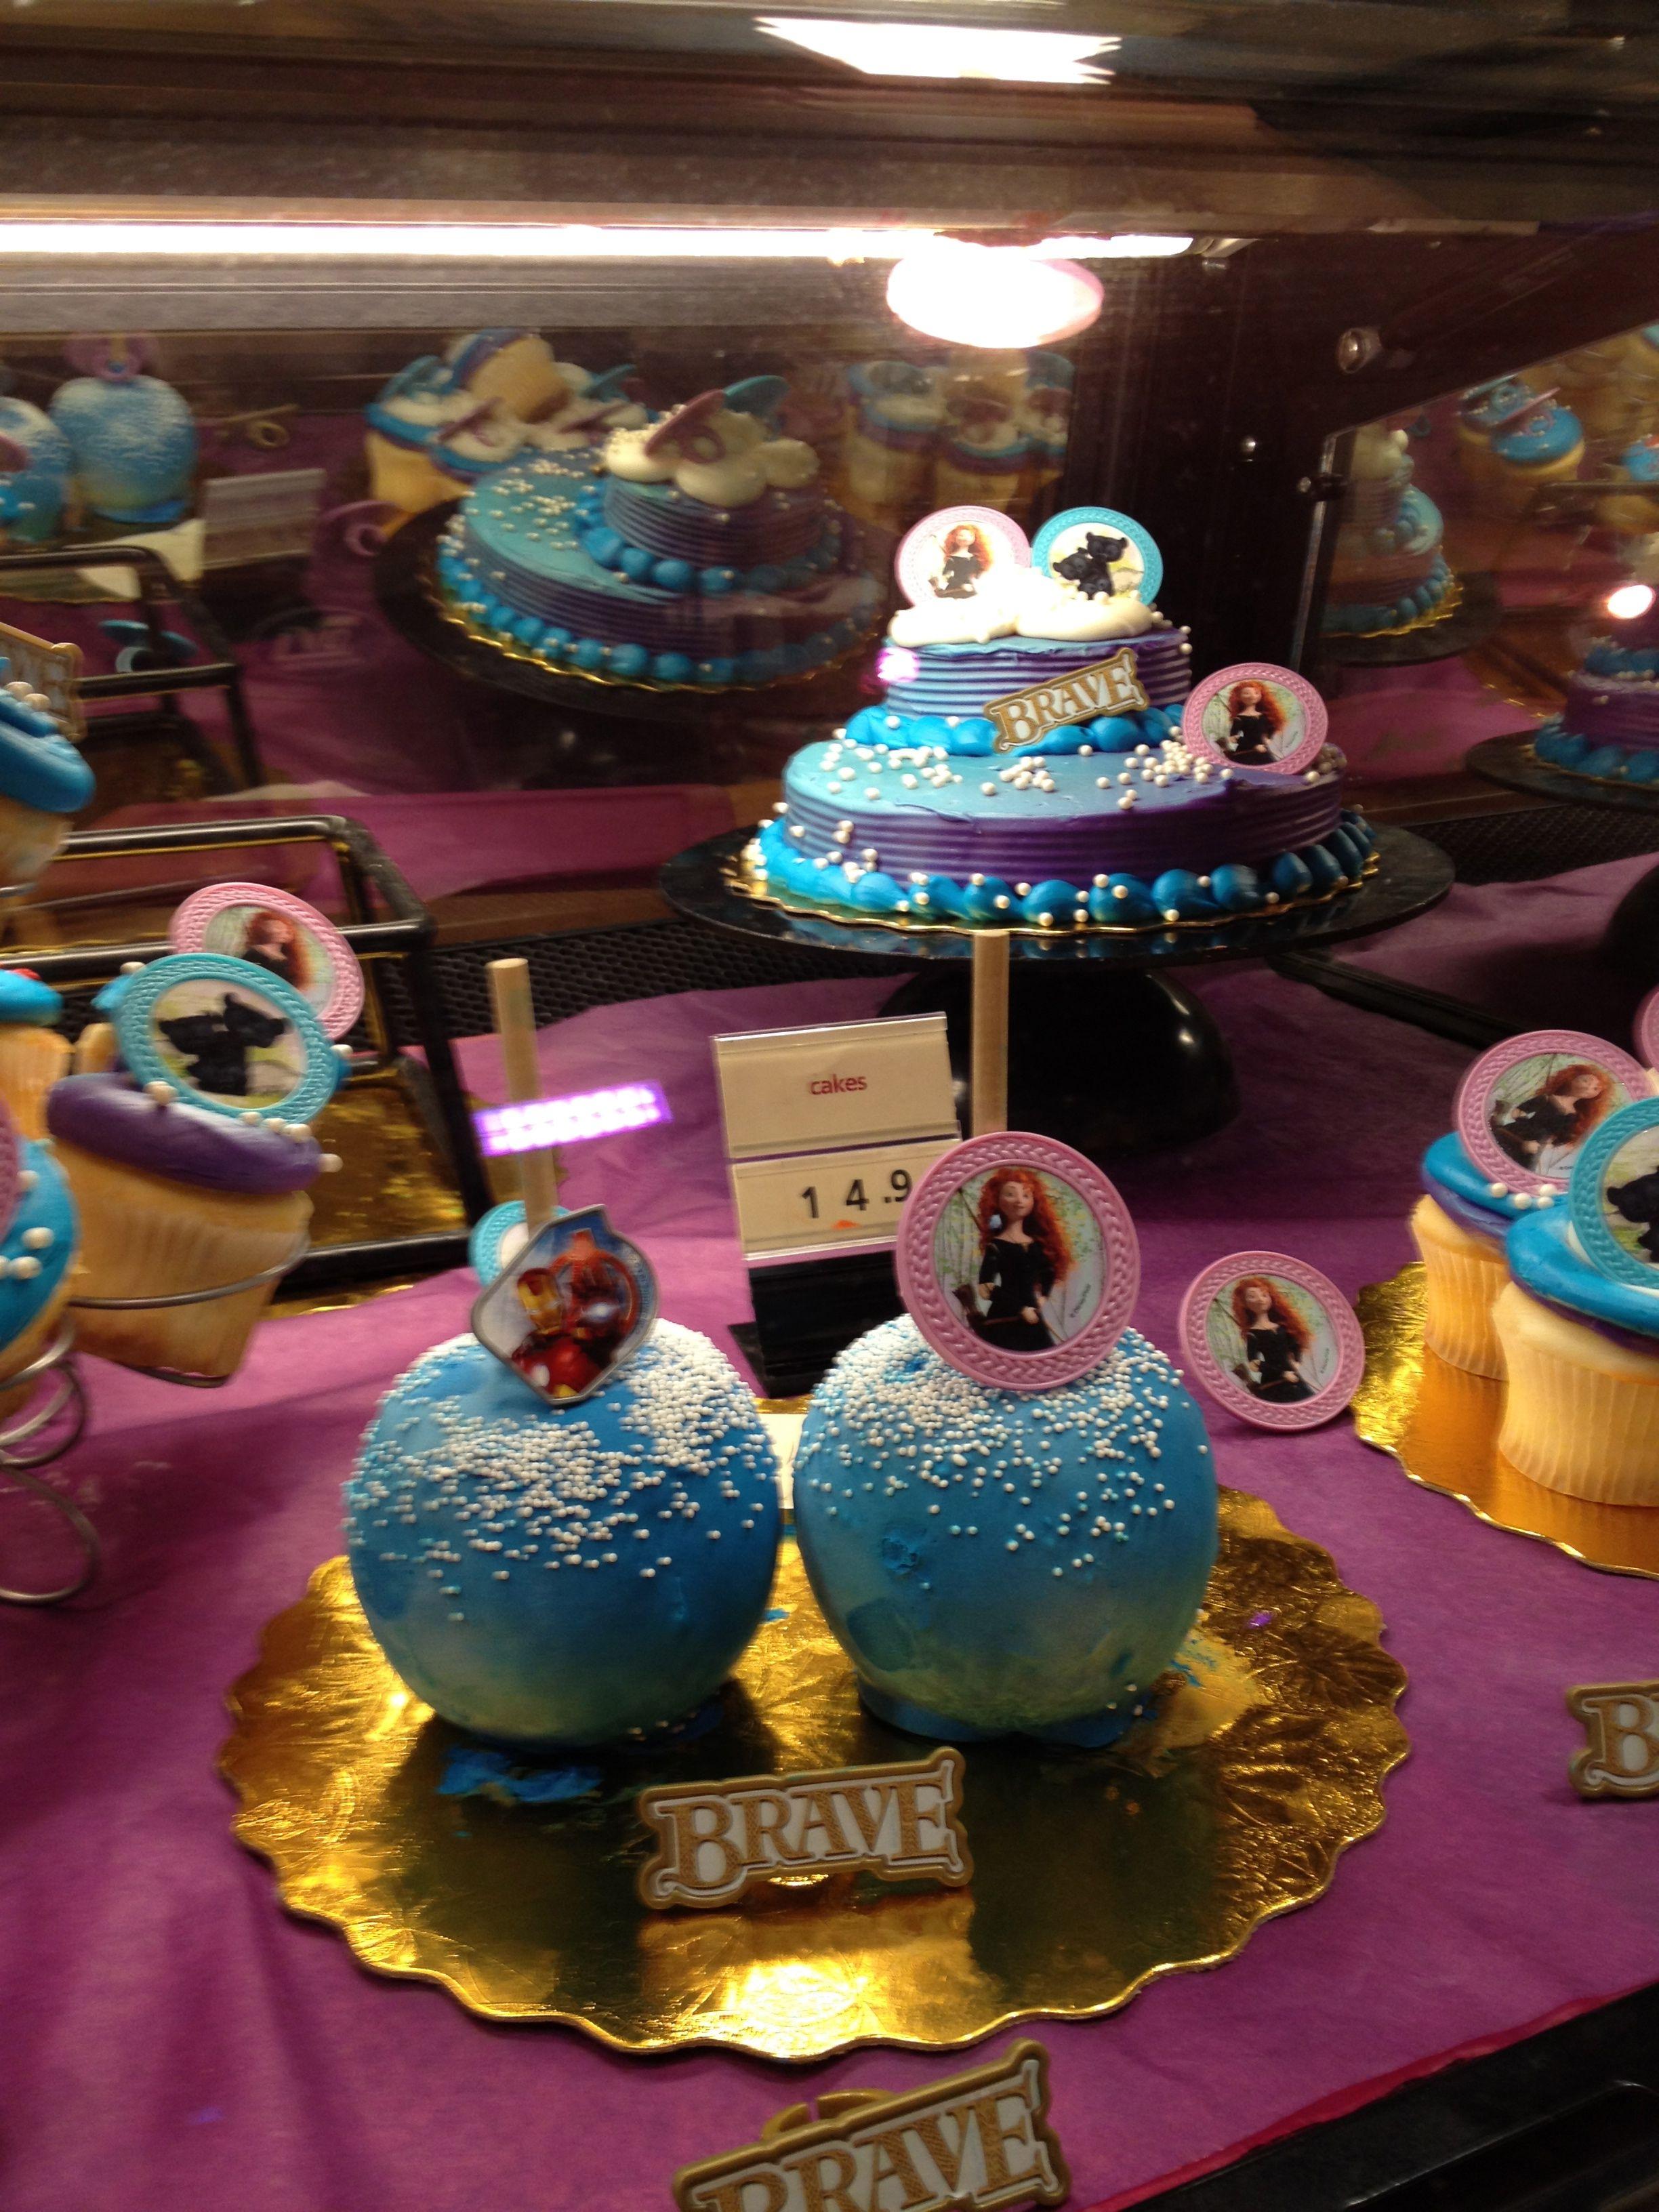 Strange Avengers Or Merida Brave Candy Apples Cake And Cupcakes I Love Funny Birthday Cards Online Elaedamsfinfo